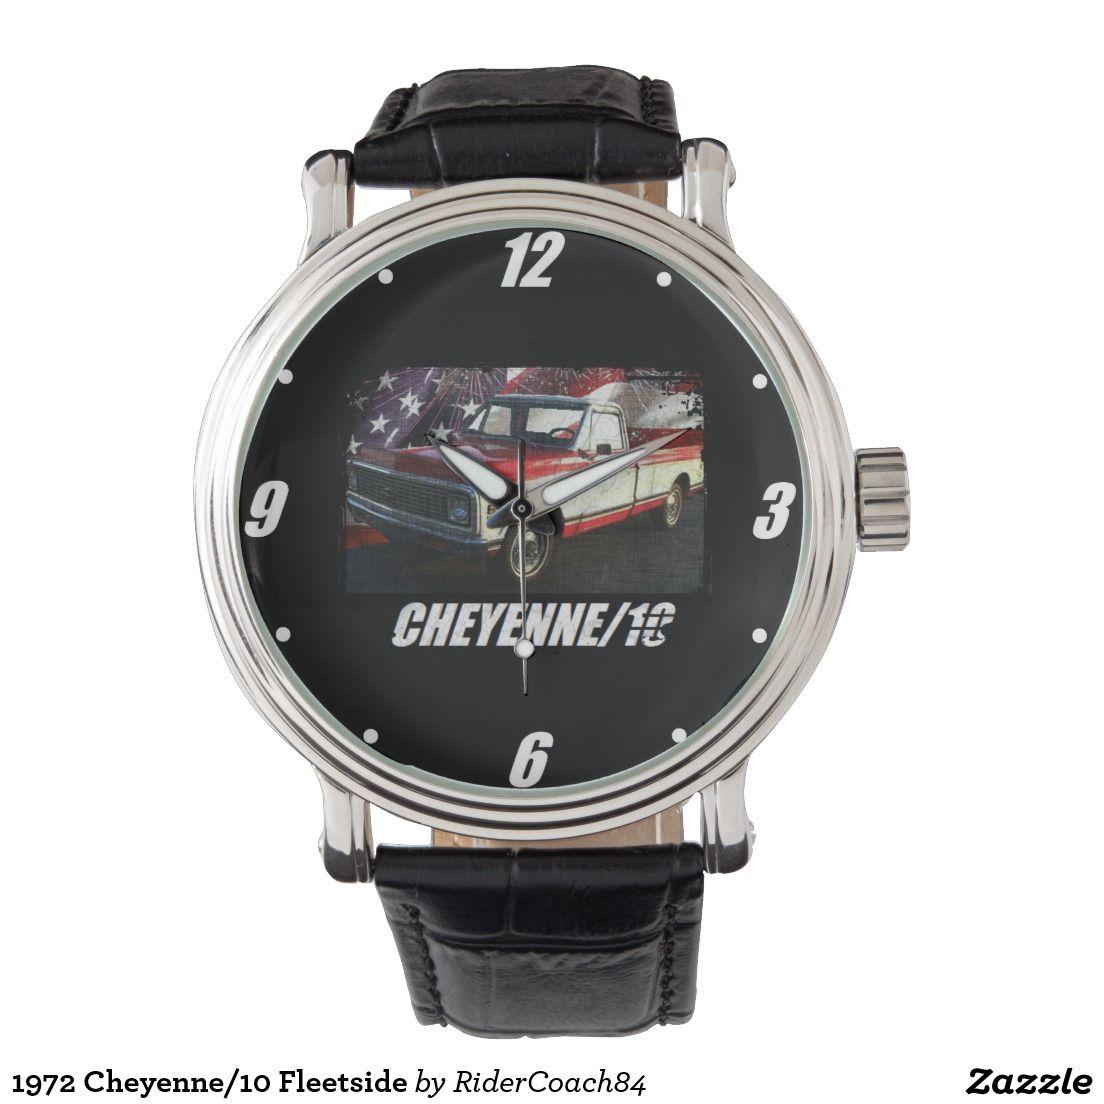 1972 Cheyenne/10 Fleetside Watches